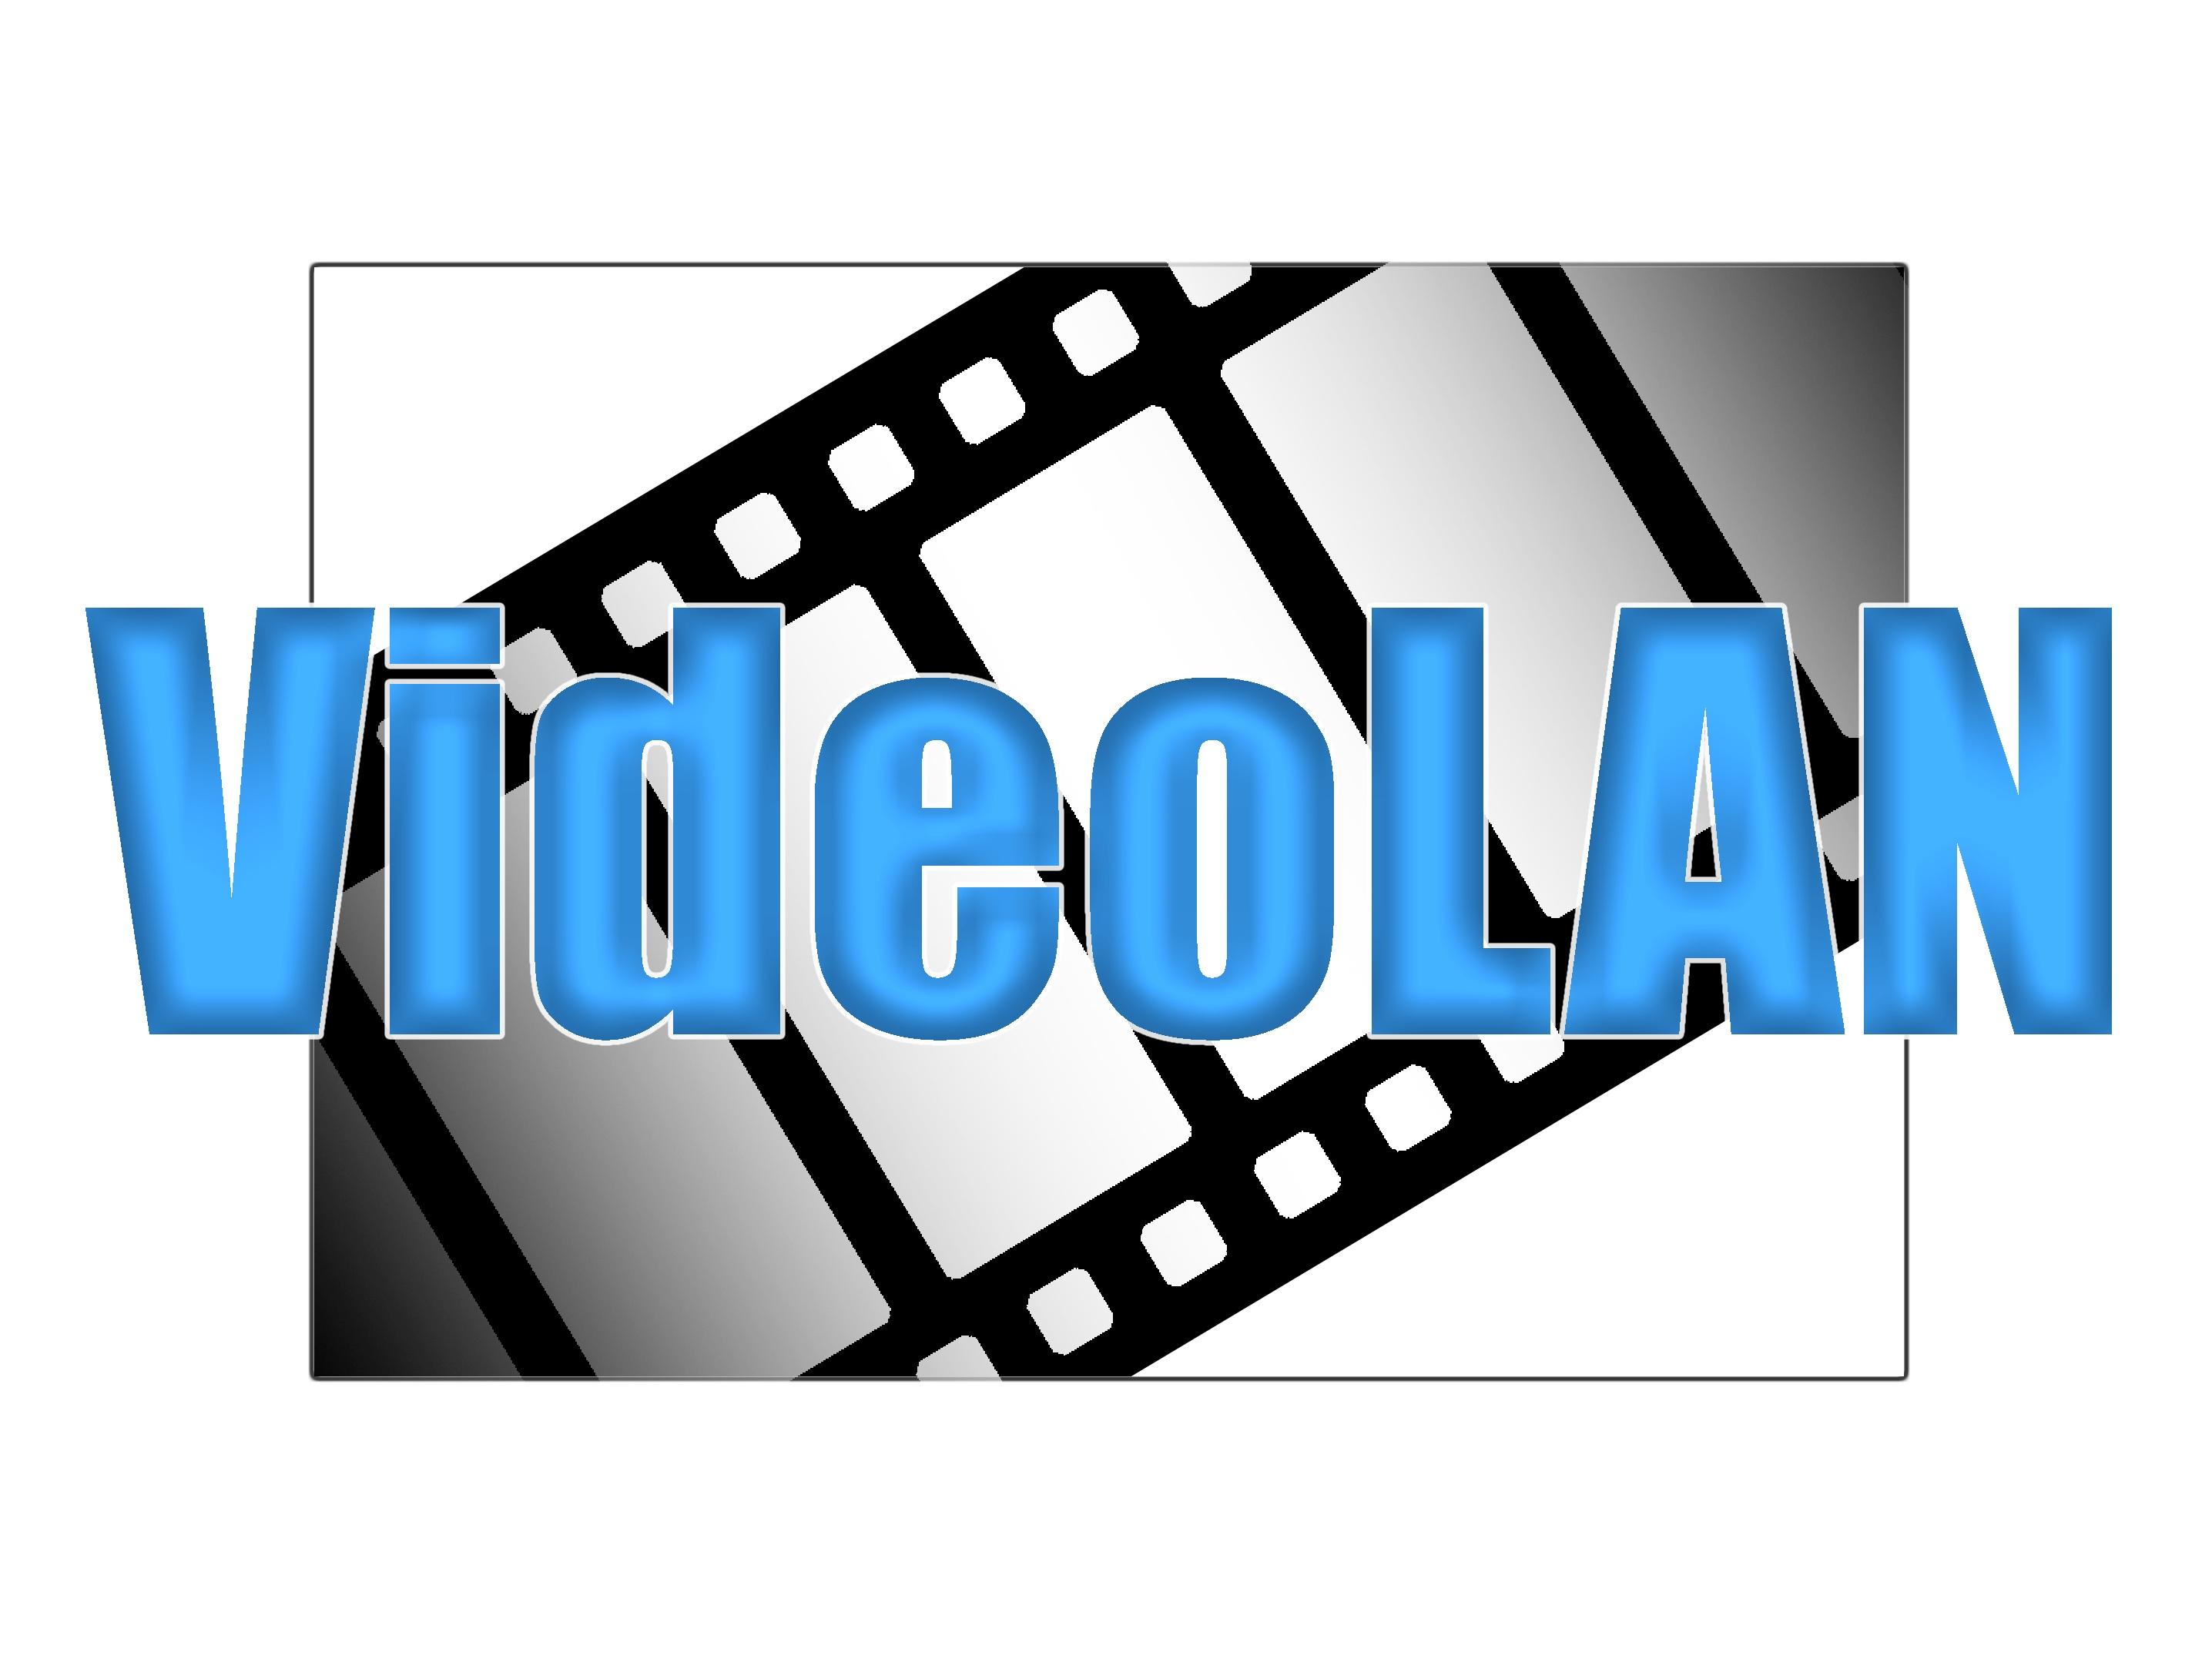 www.videolan.org/images/goodies/videolan/vl4_2872x2154.jpg